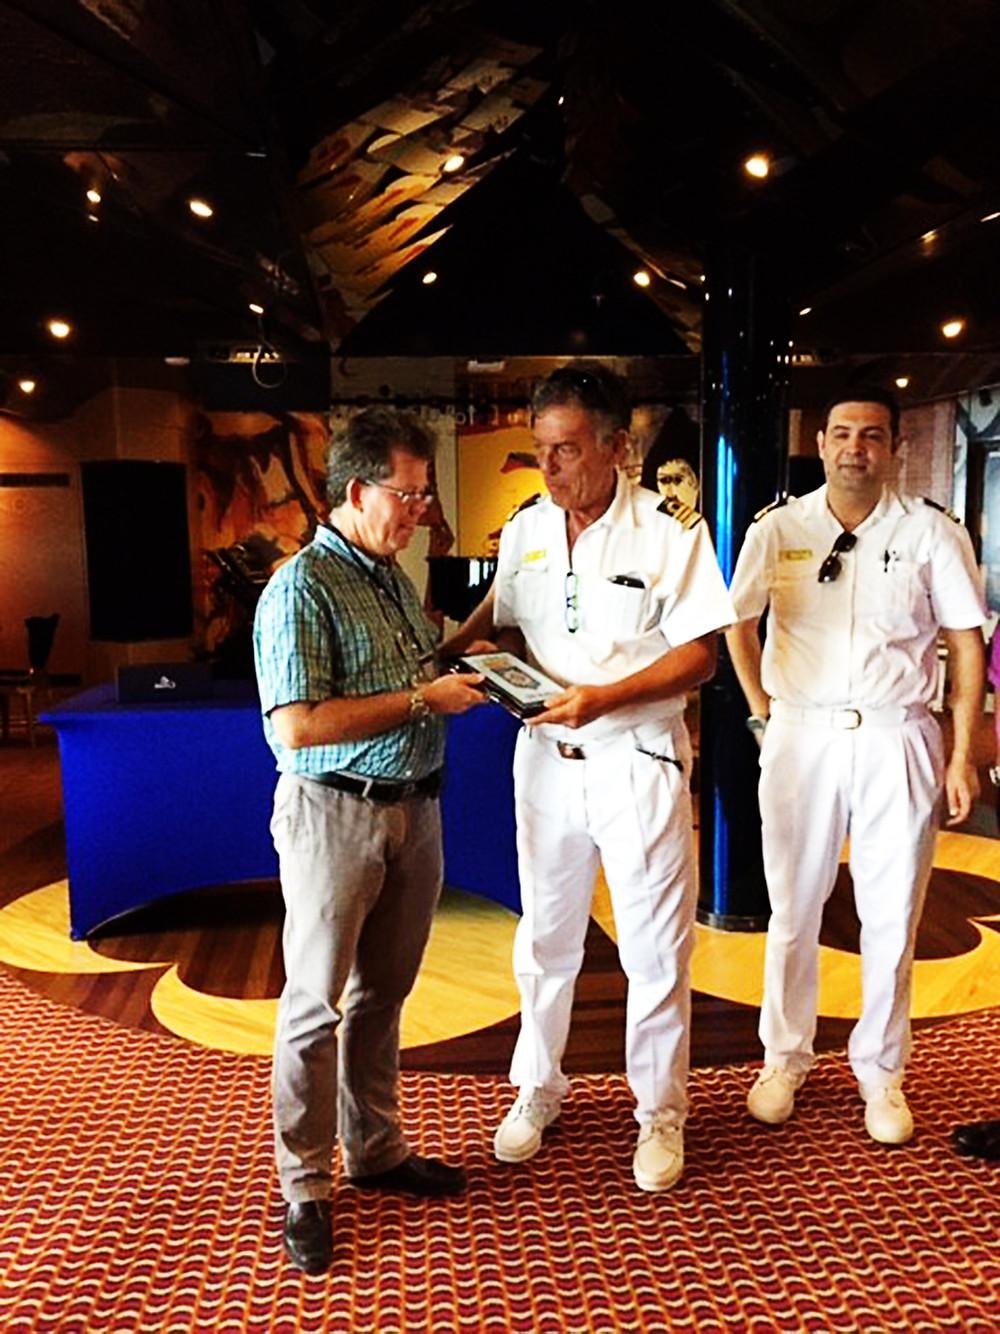 XpBonaire, IslandLife, Bonaire, News, Information, TCB, Cruise Ships, Codsta Magica